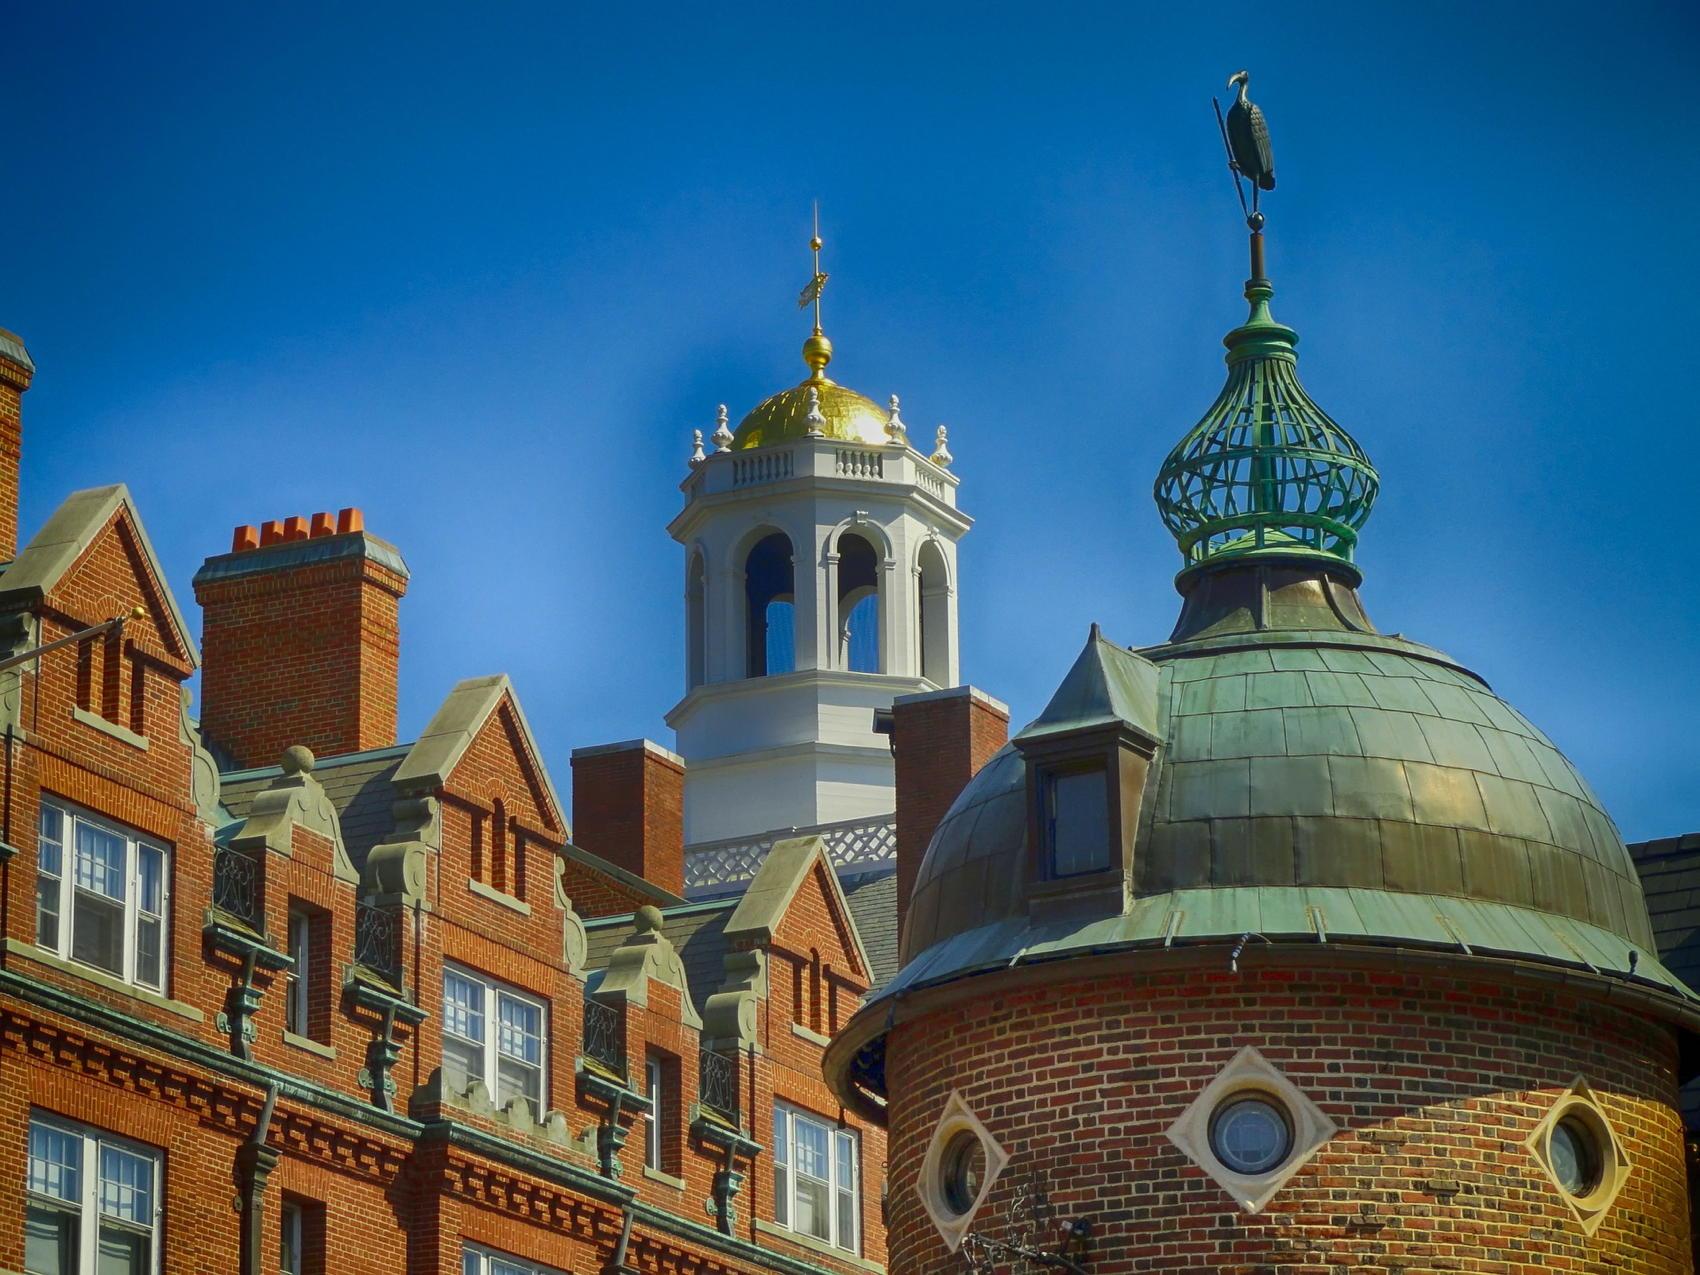 Harvard University - Image by David Mark